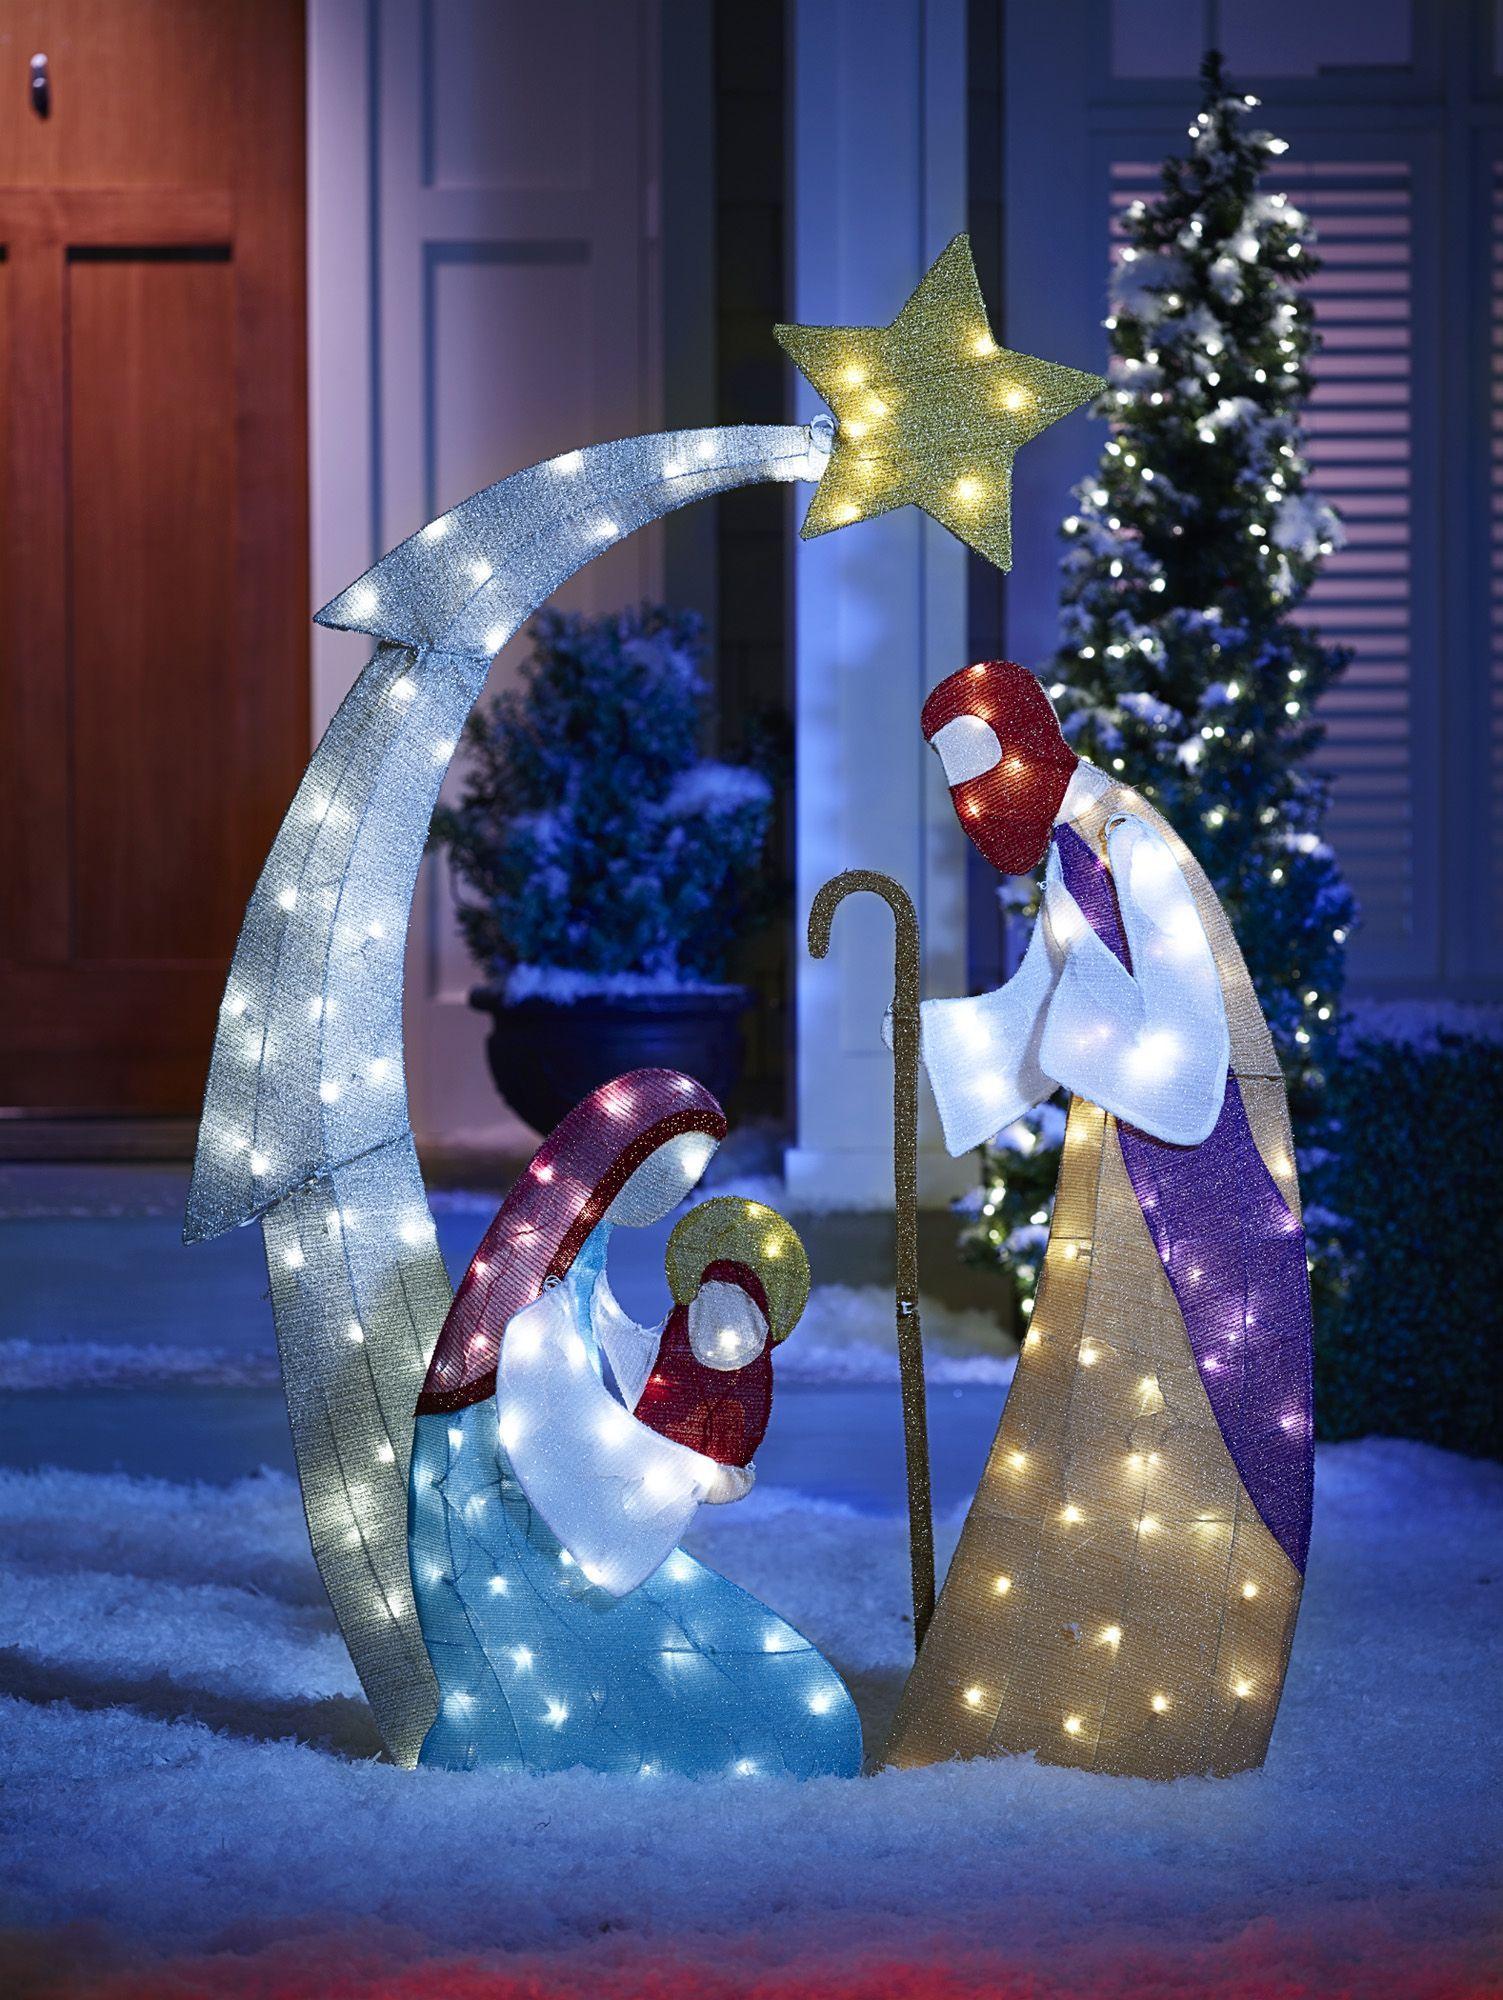 Fingerhut alcove Lighted Nativity Scene Outdoor